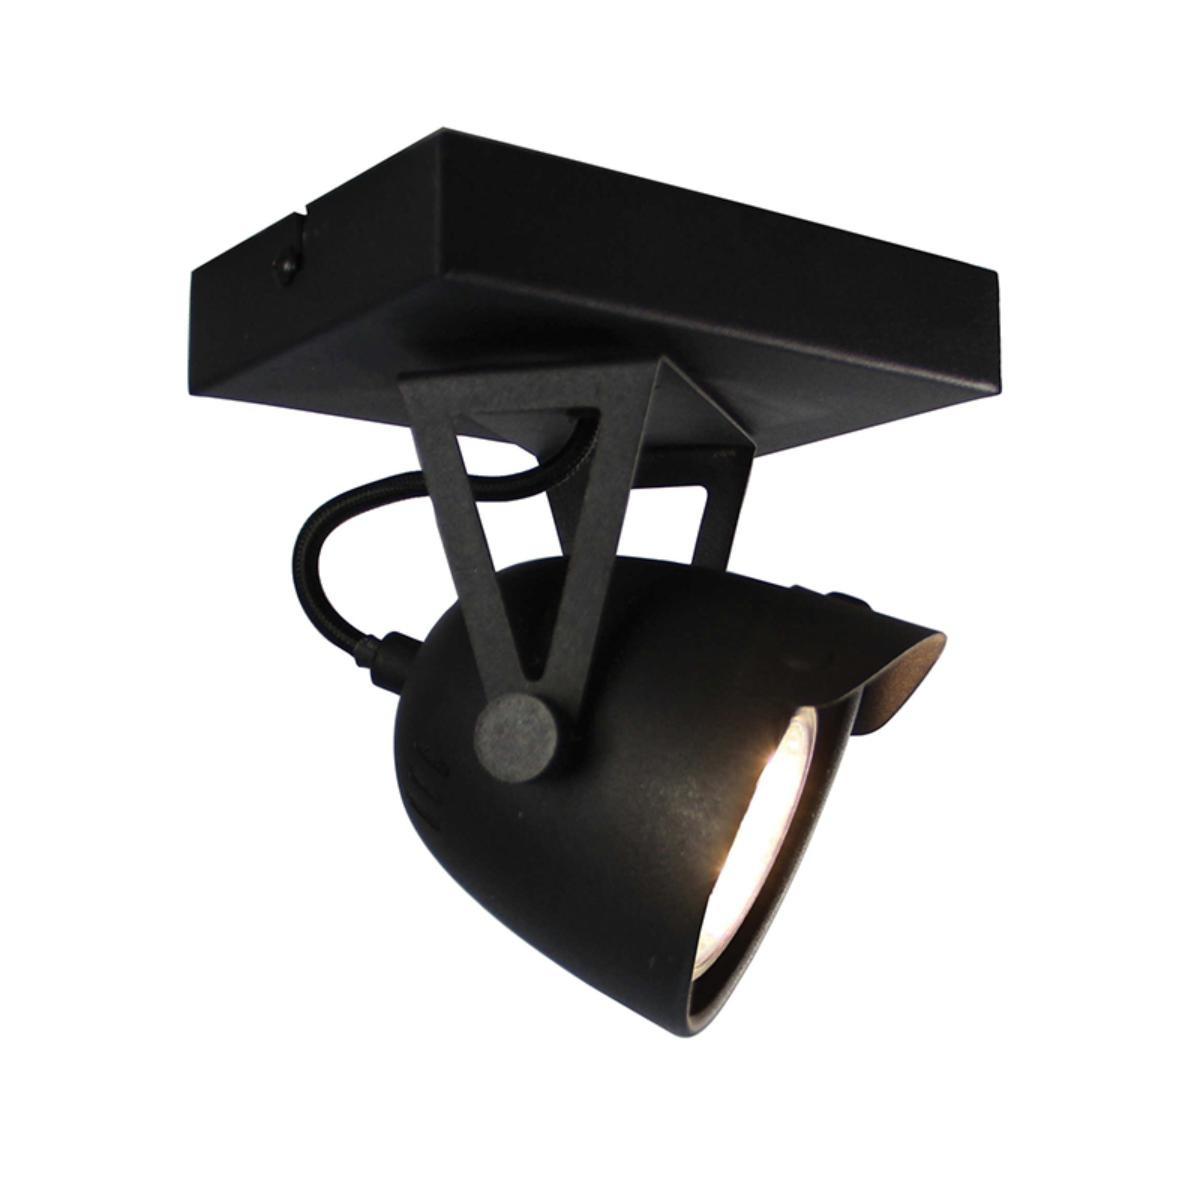 Spot Cap led - Zwart - Metaal - 1 Lichts